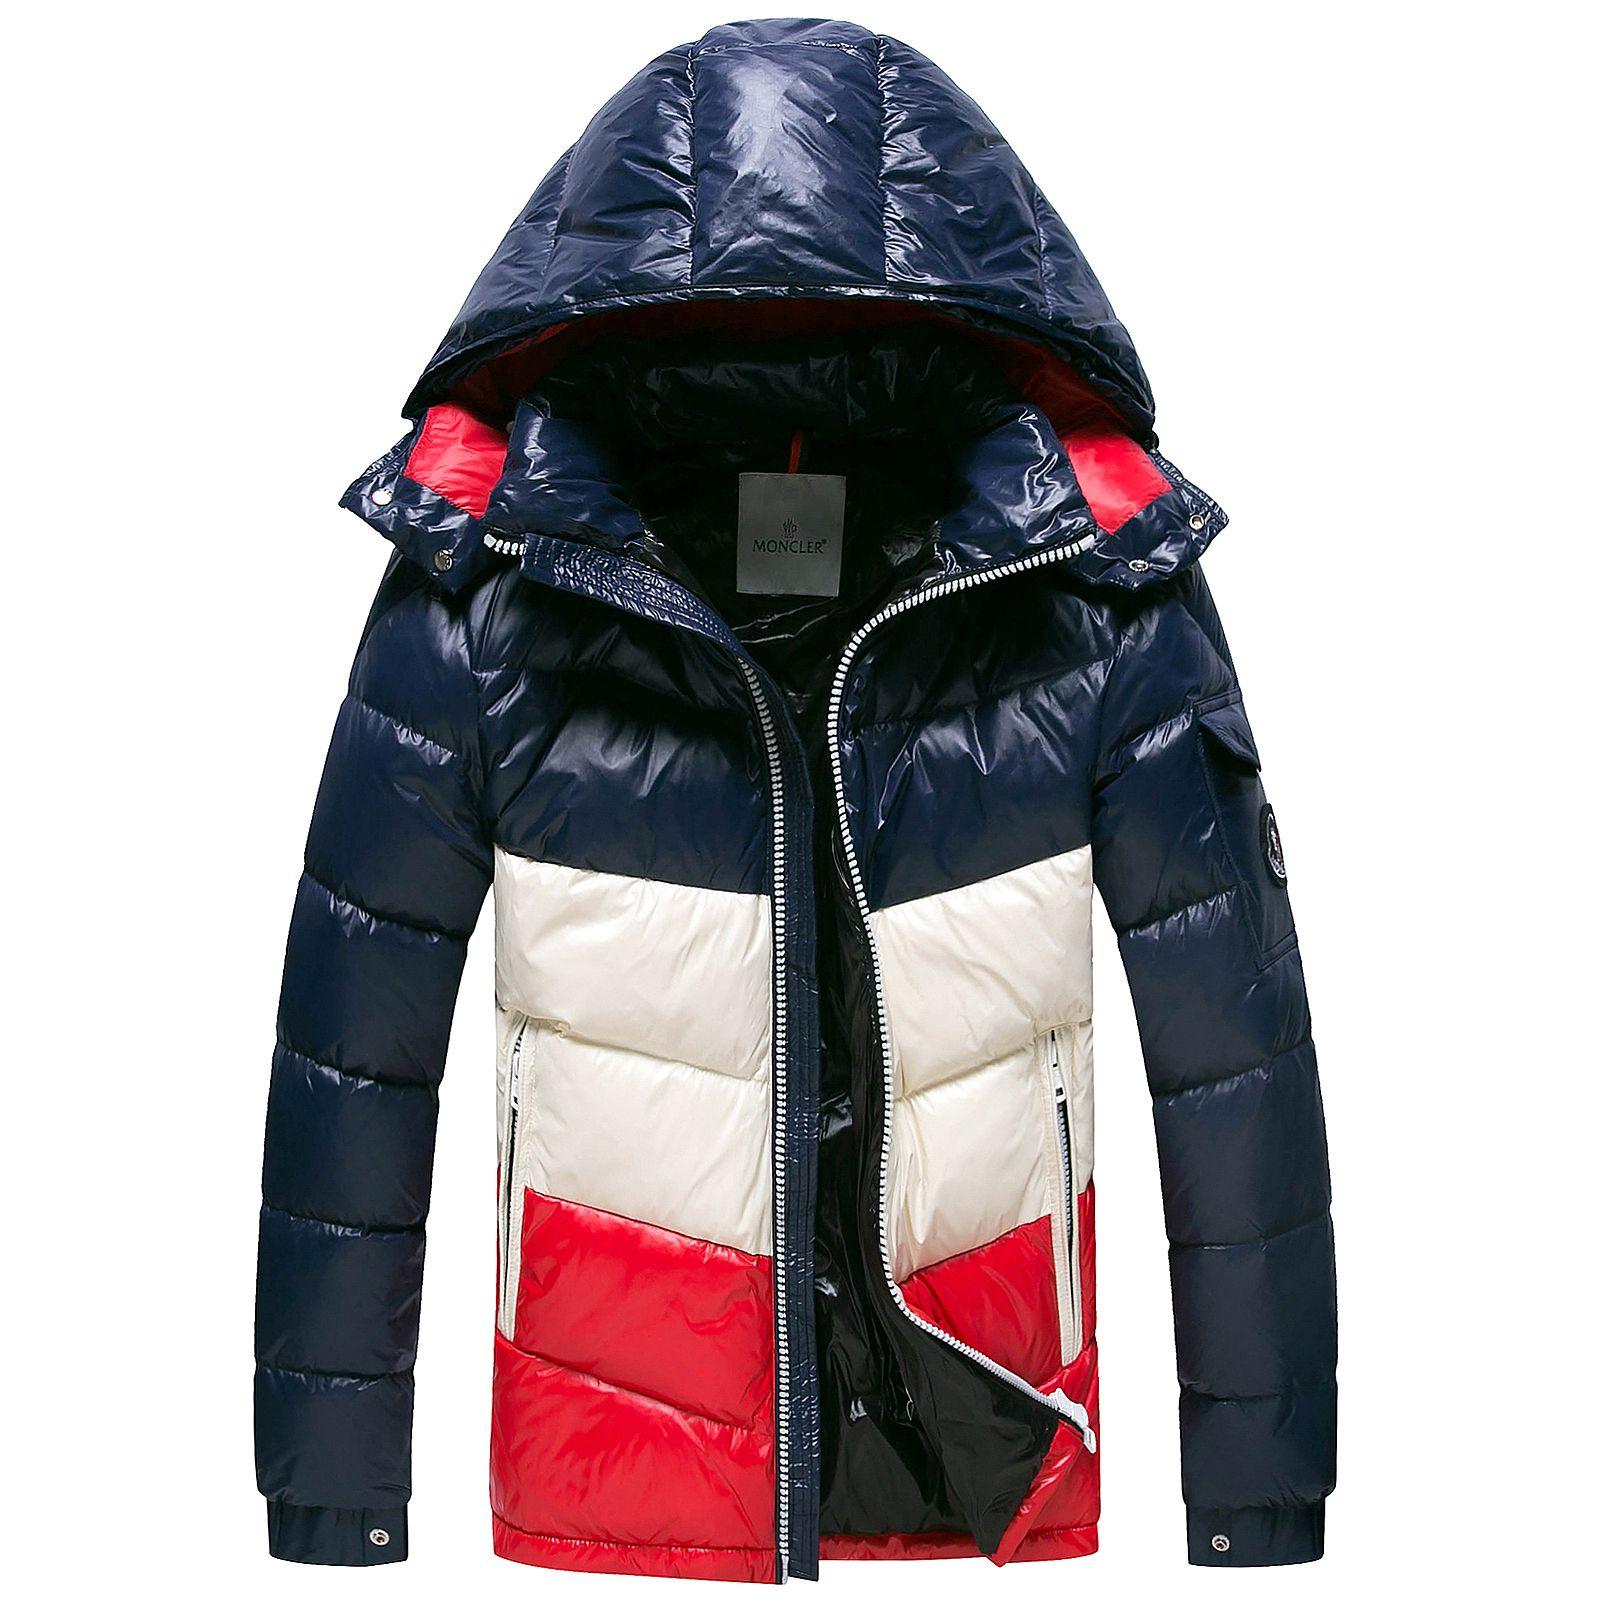 449934ef667ad 2019 2018 Newest Winter Men Down Jackets Men Warm Apparel Women S Clothi 90%  White Duck Down Jackets Parkas Long Down Coats   Parkas 985 From  Brandstore0